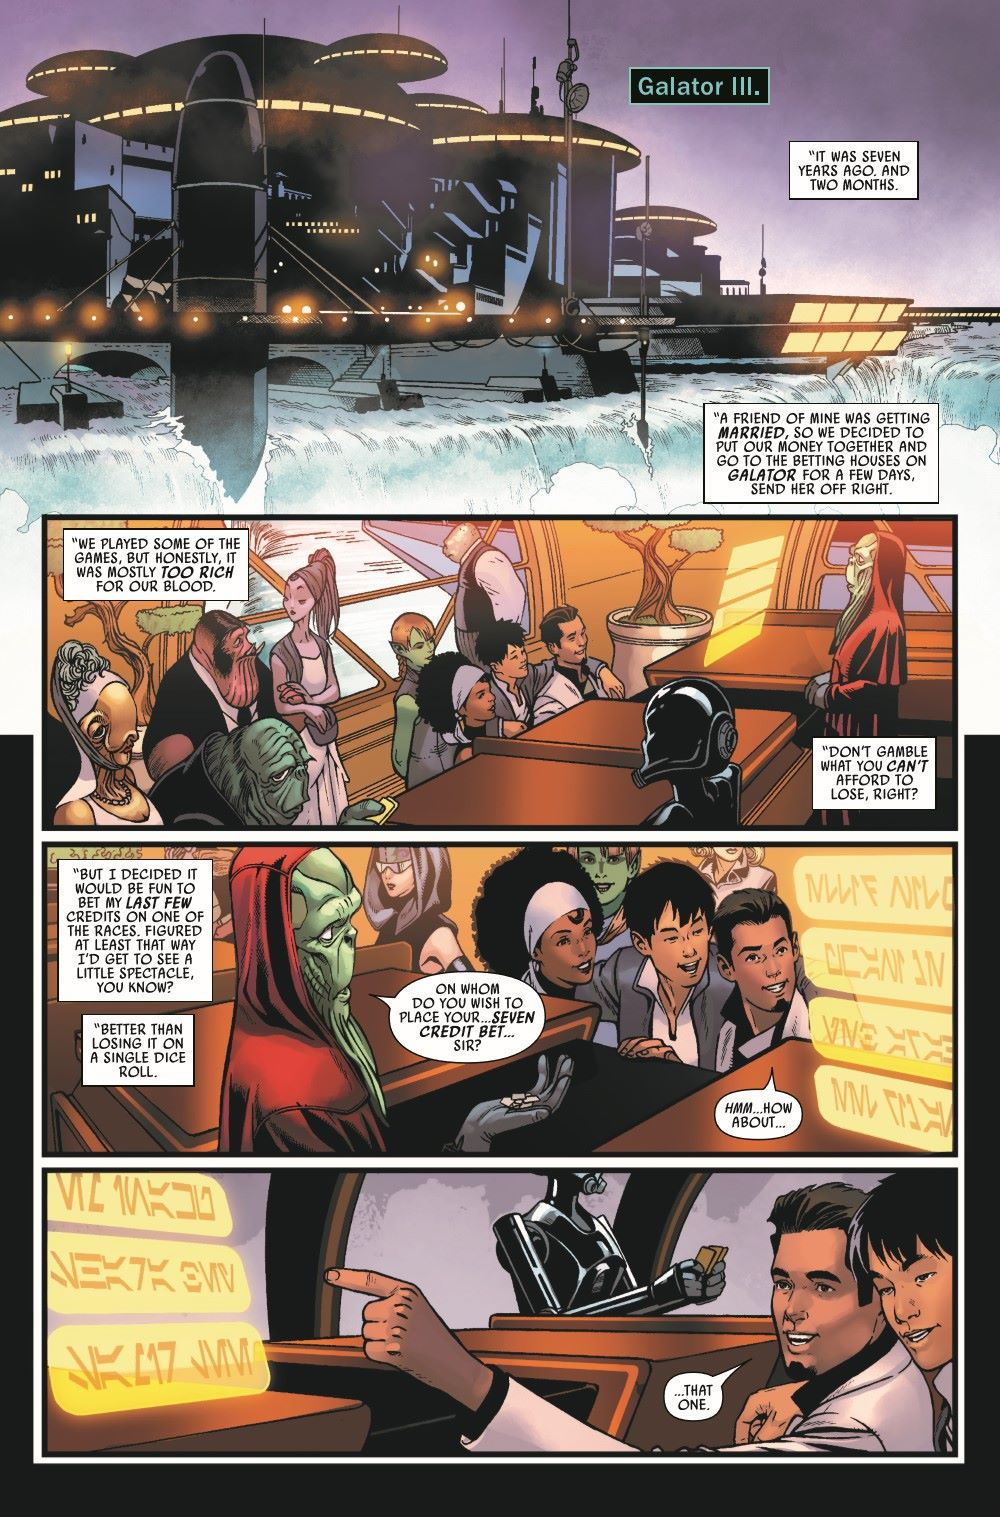 STWARS2020012_Preview-6 ComicList Previews: STAR WARS #12